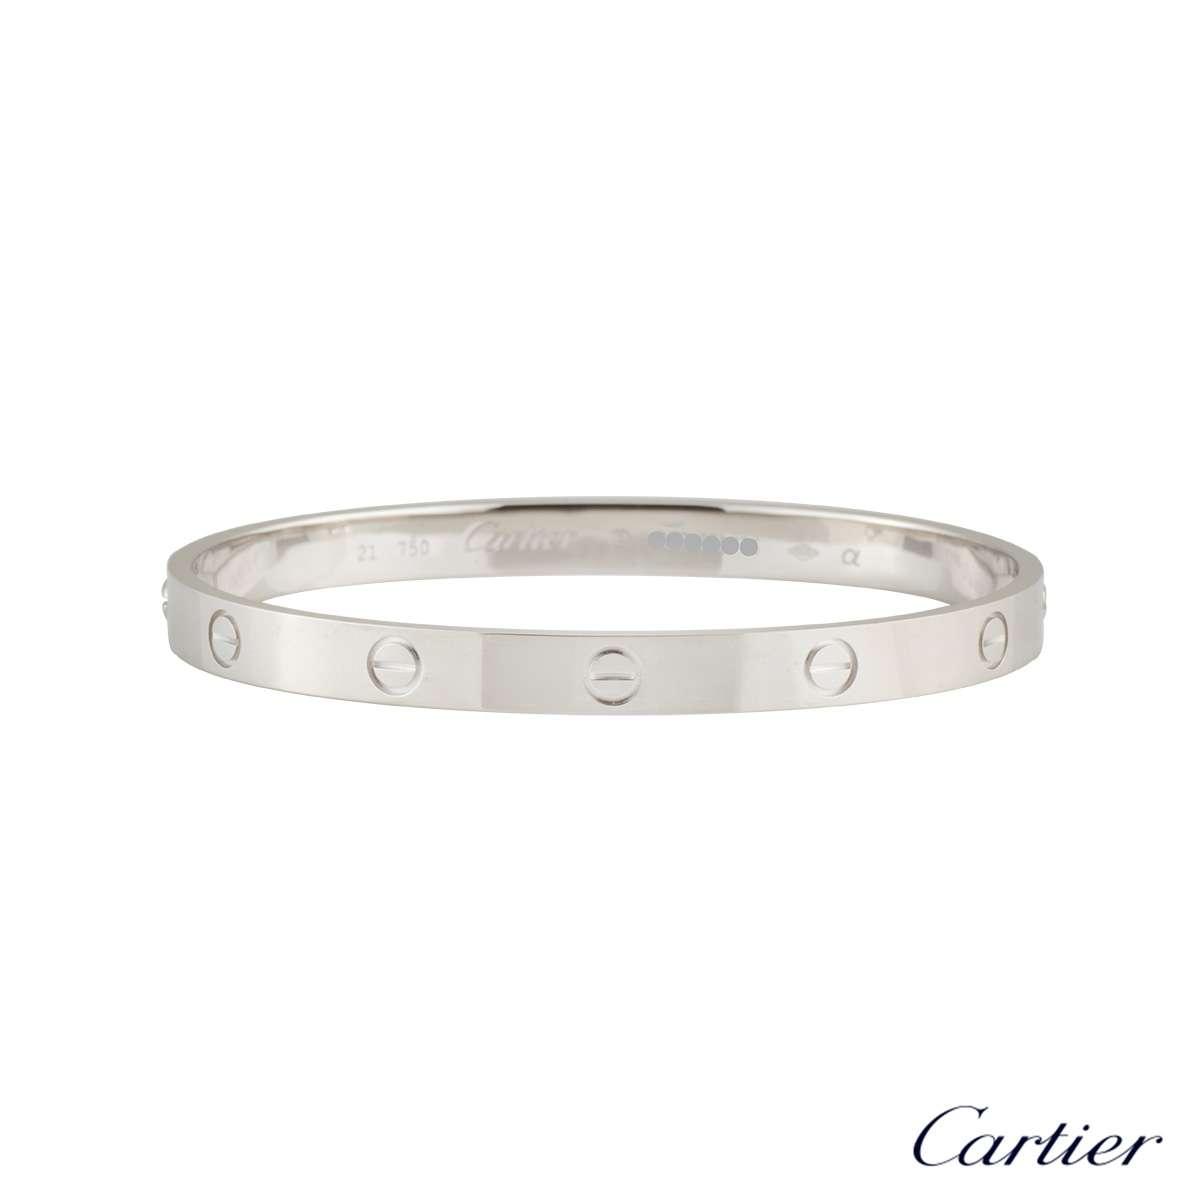 Cartier White Gold Plain Love BraceletSize 18 B6035418